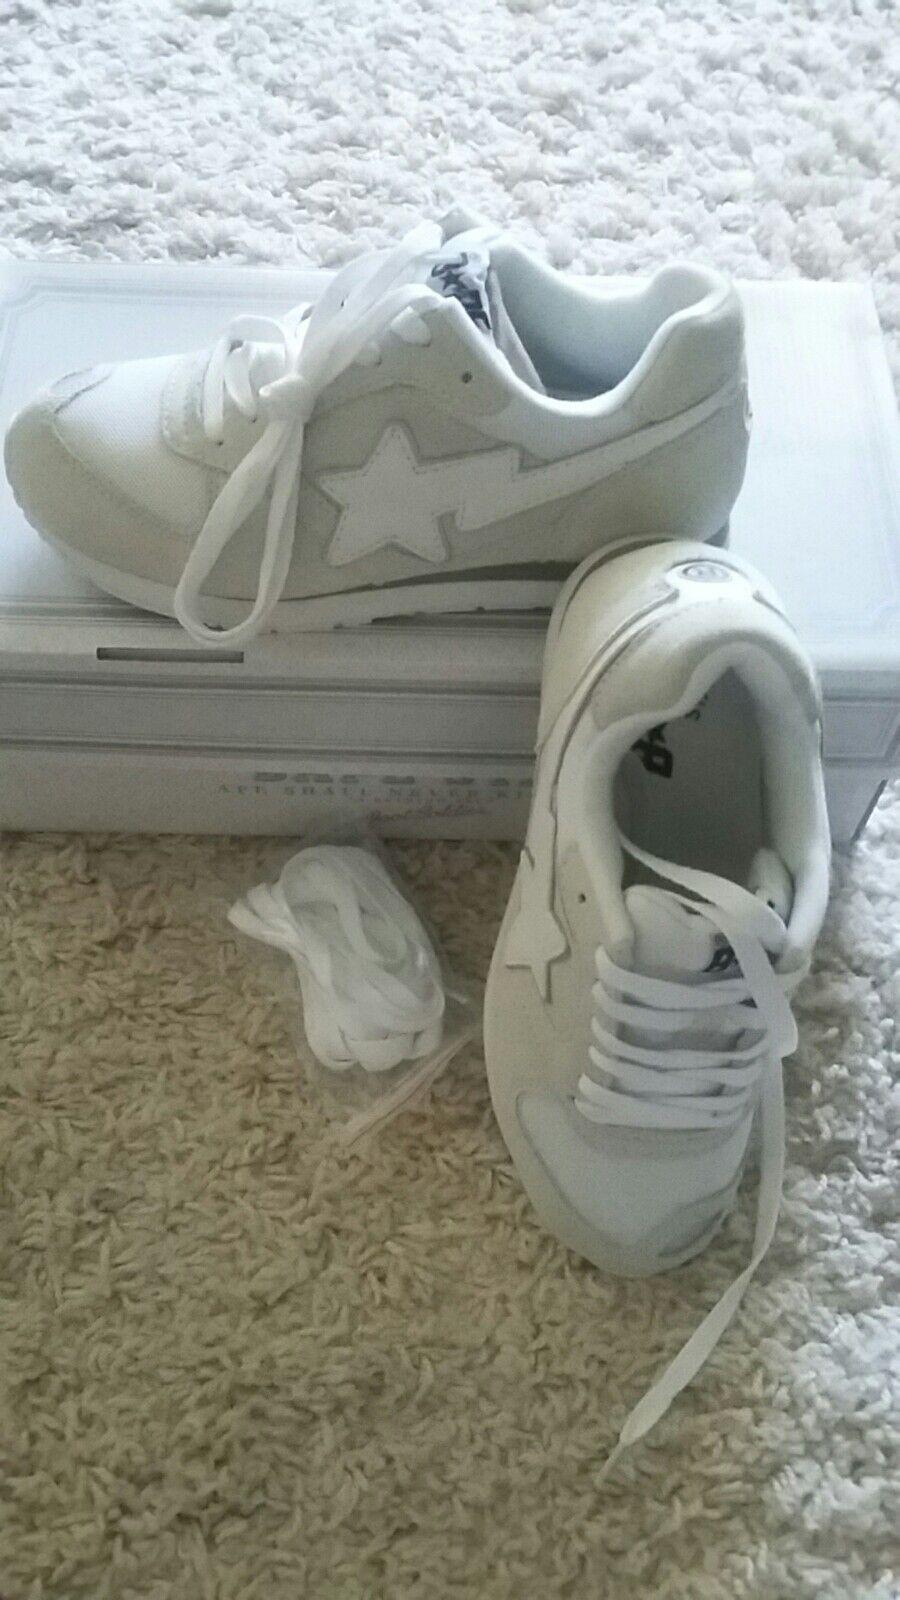 Nike air jordan 11 nero retrò xi nero 11 / bianco, rosso / rude palestra ginnastica sz 9 9b4c4d